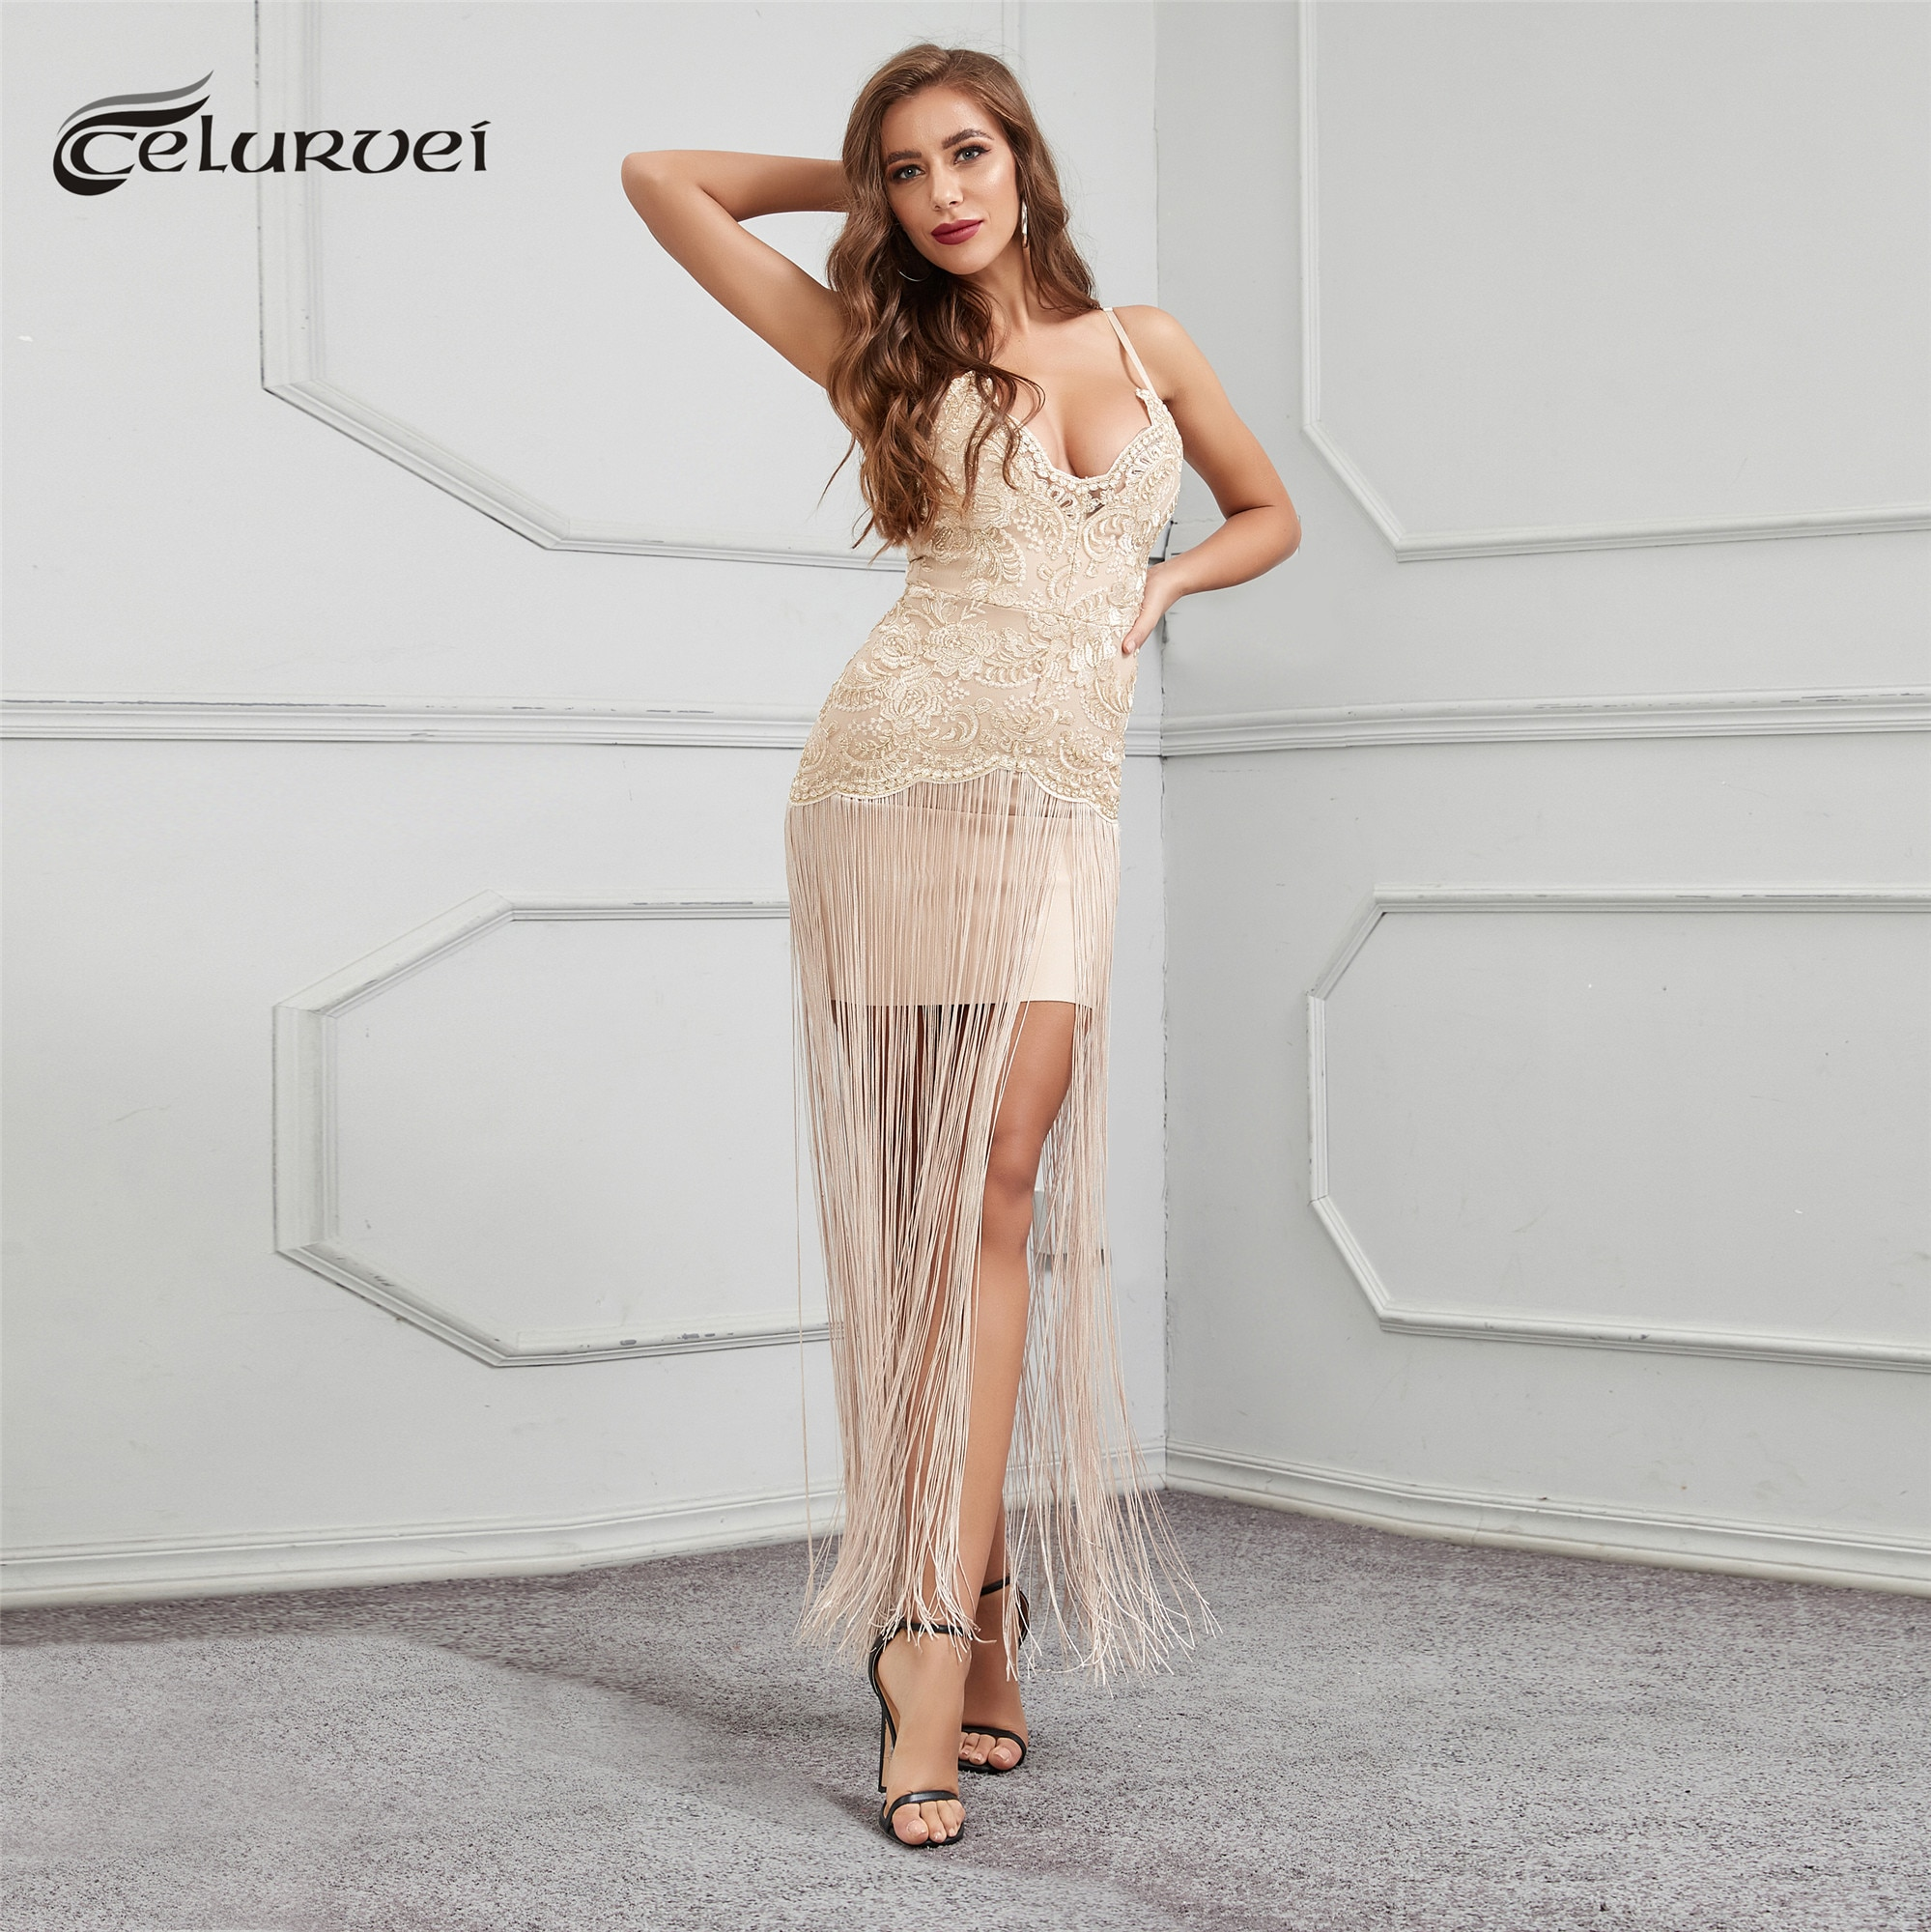 High Quality Black Khaki Slip Lace Tassel Long Rayon Bandage Dress Night Party Bodycon Dress